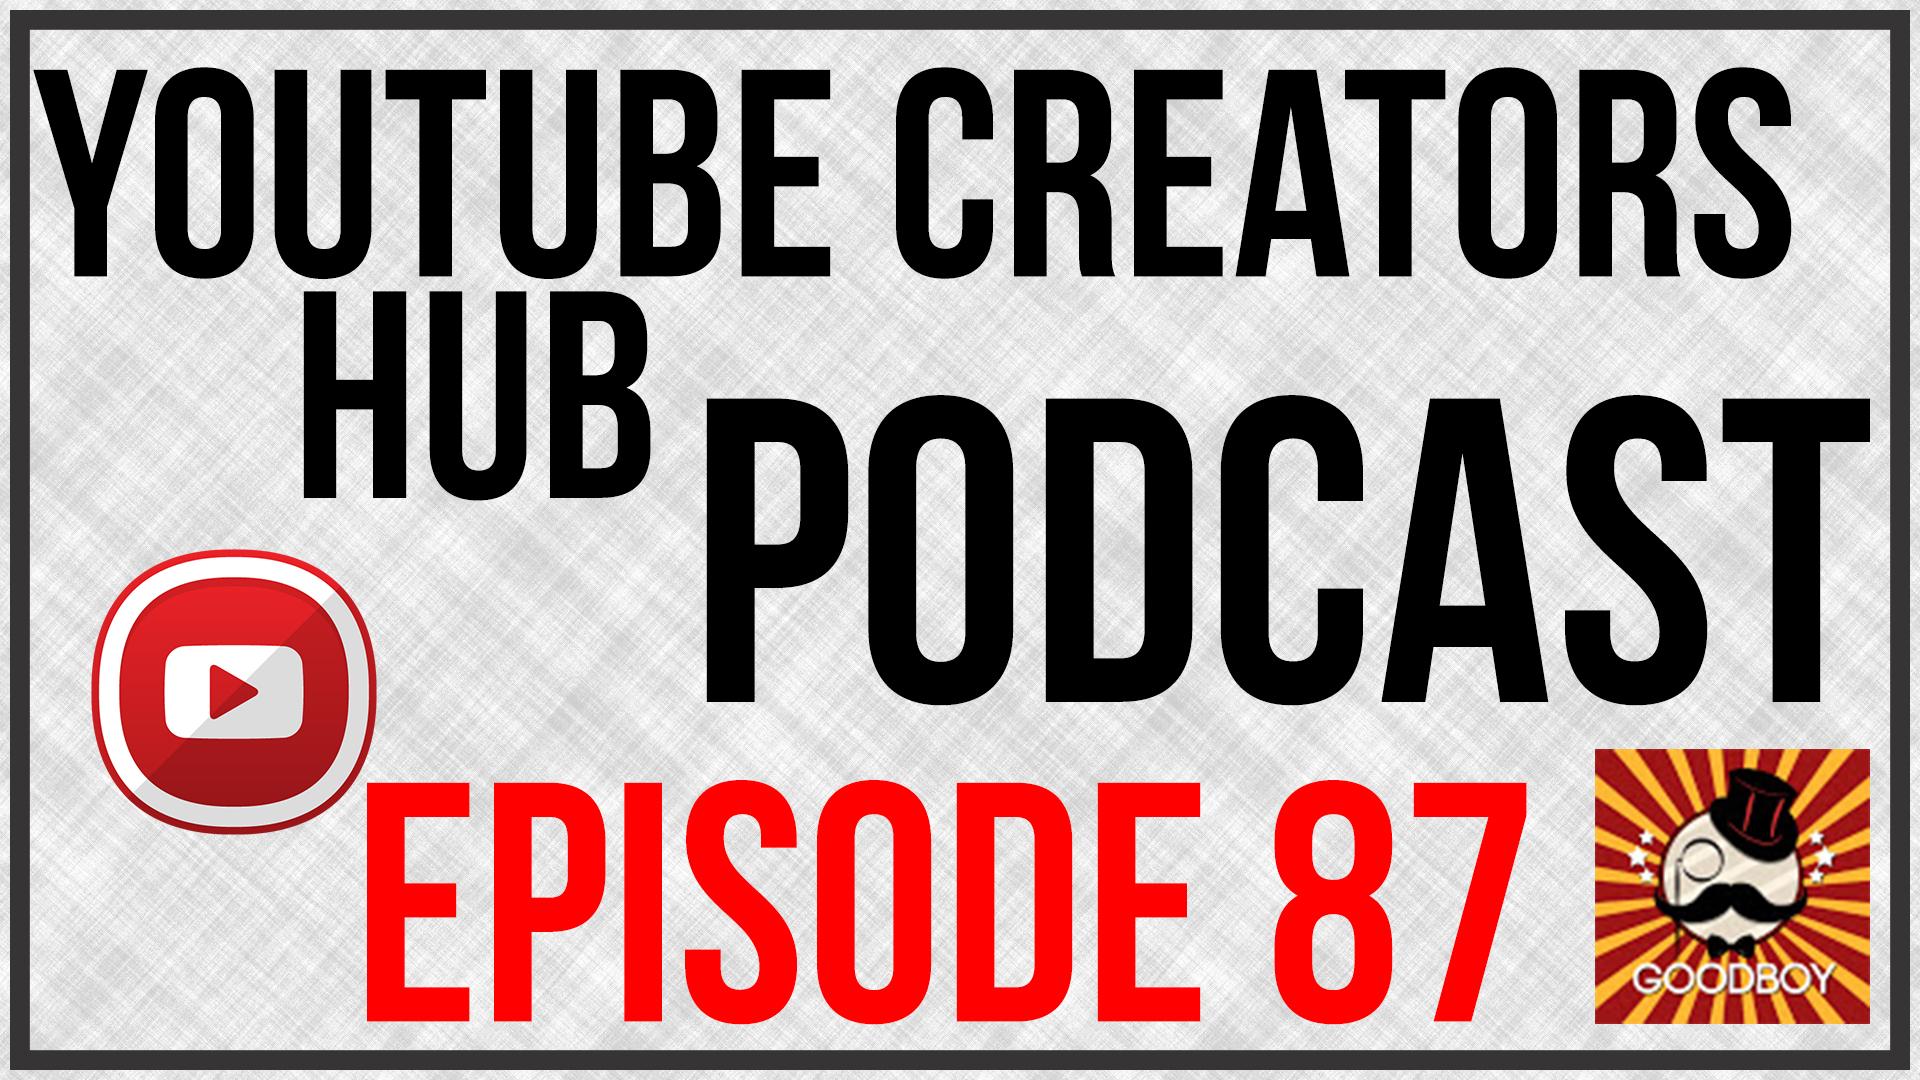 YouTube Creators Hub Podcast Episode 87